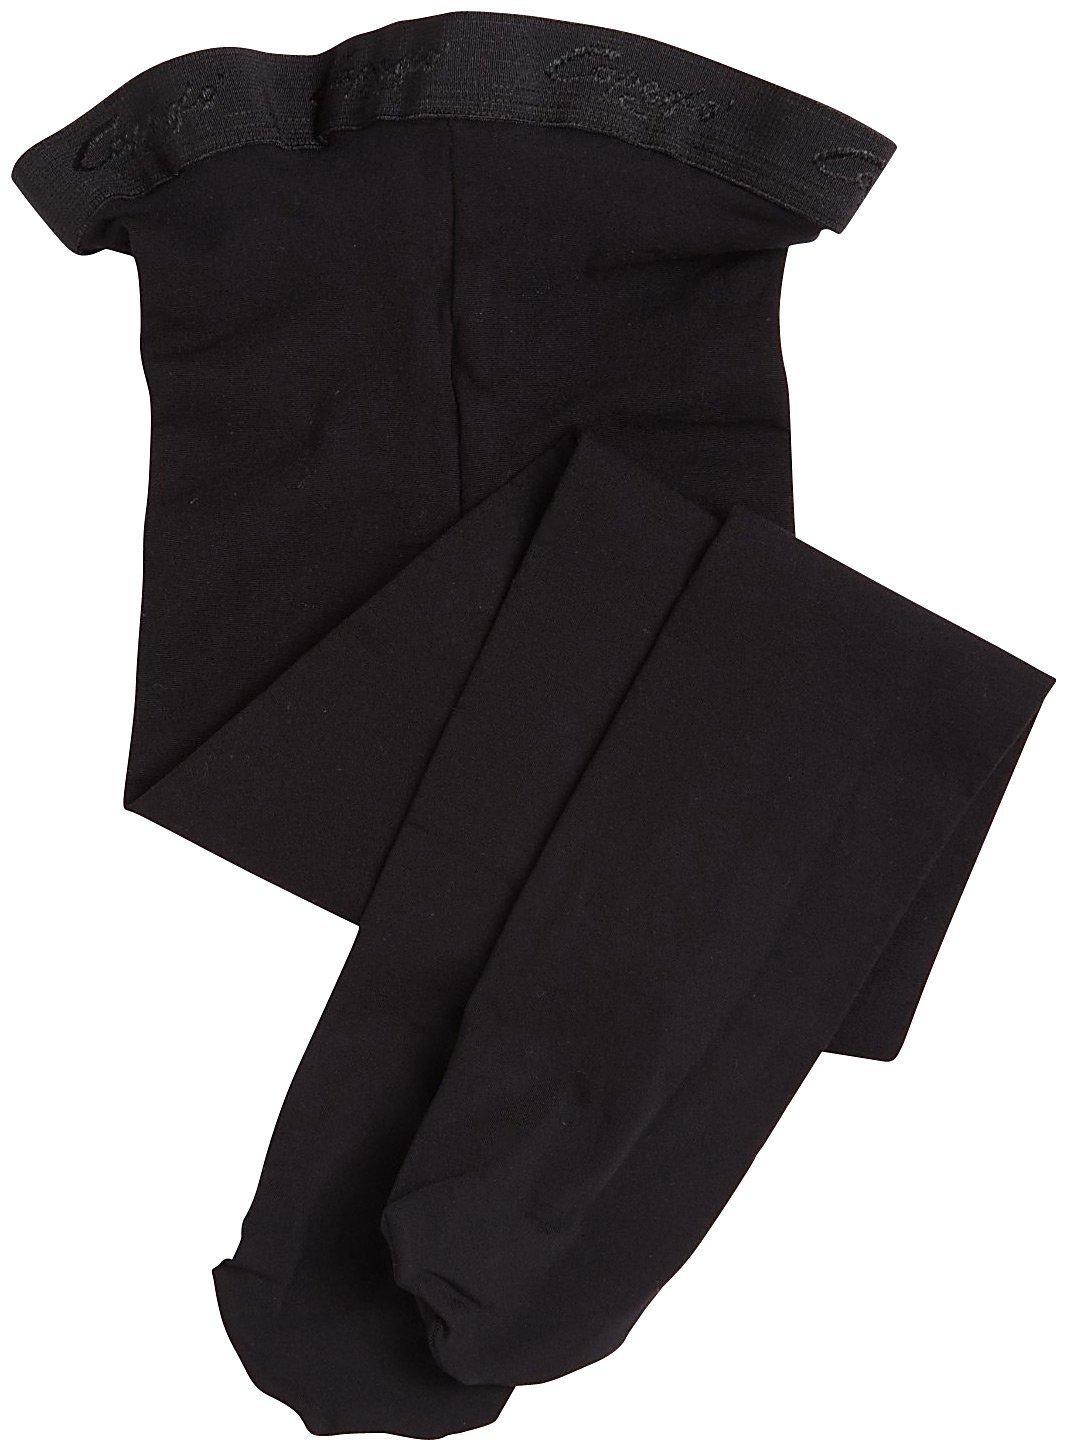 Capezio Little Girls' Ultra Soft Transition Tight, Black, One Size (Kid 2-6)